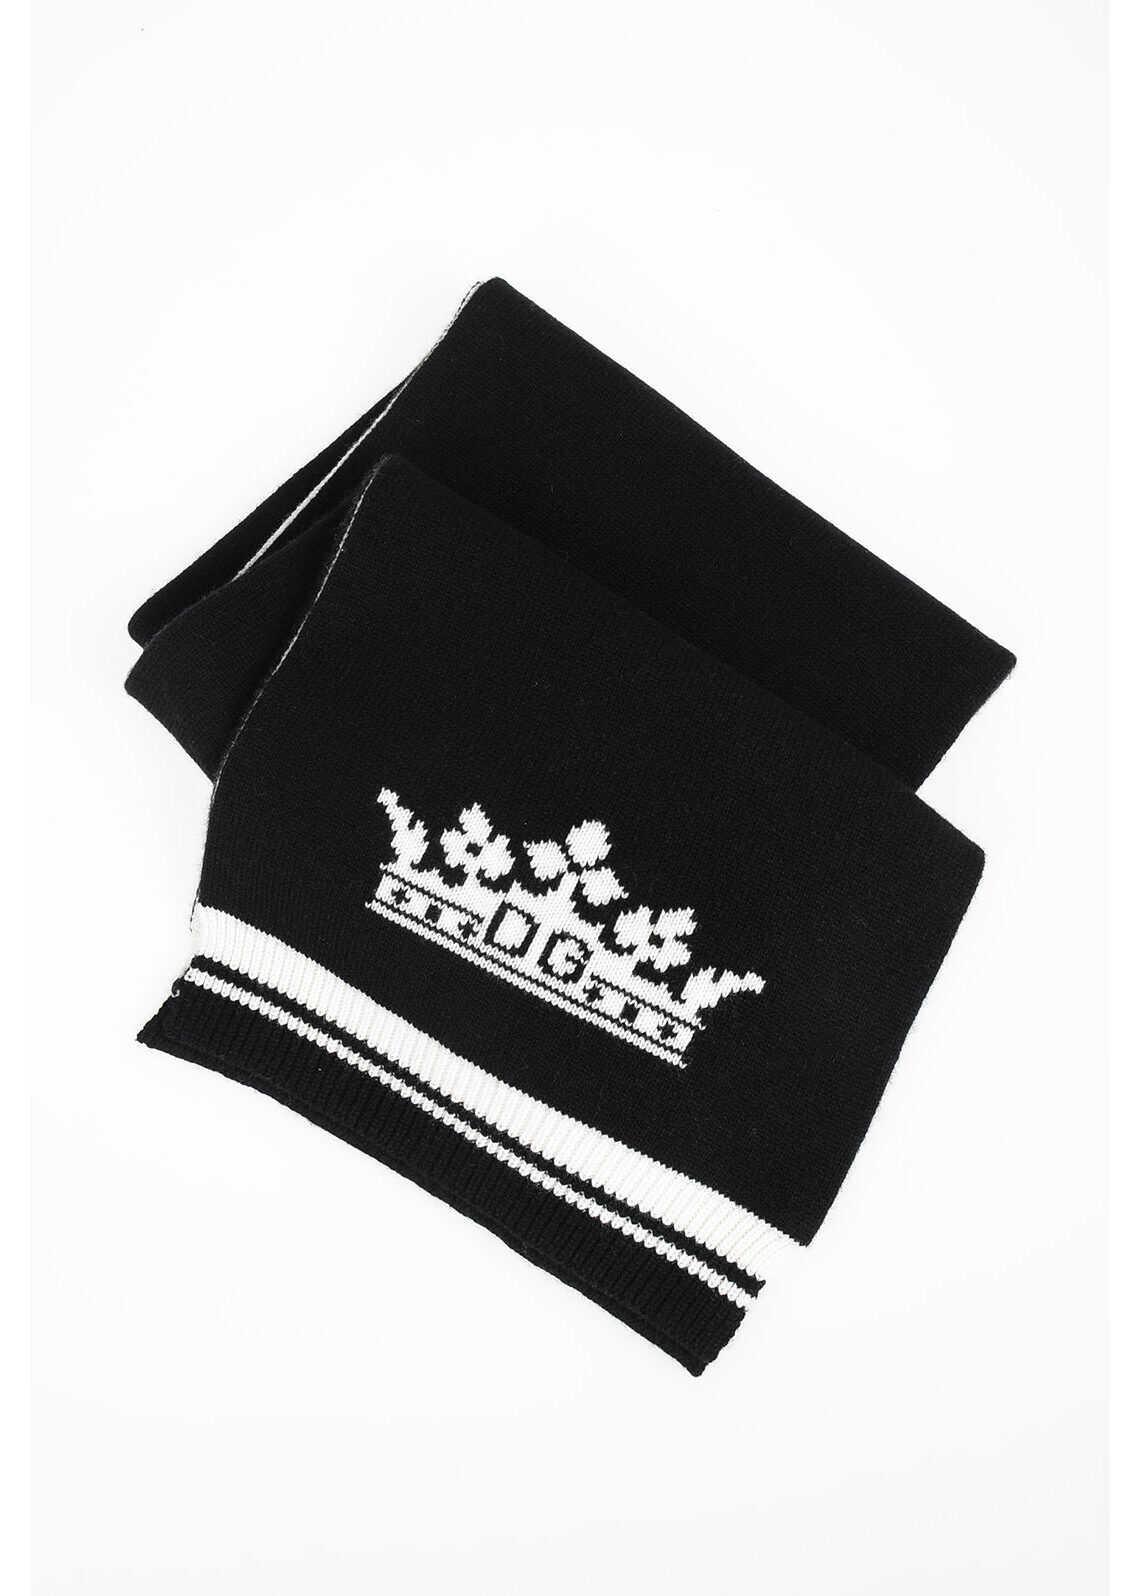 Dolce & Gabbana Cashmere PRINCE Scarf BLACK